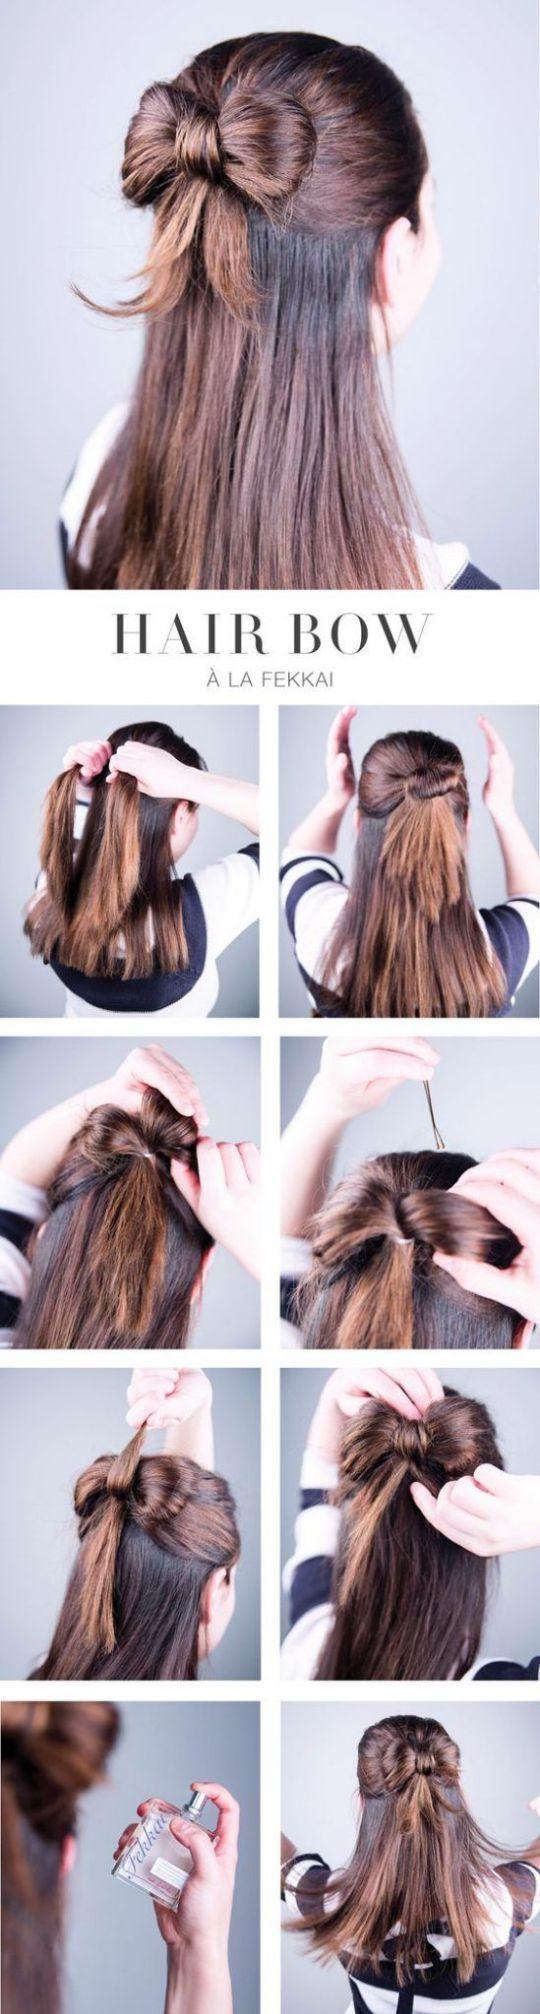 Easy half up half down hairstyles hair bow hair ideas